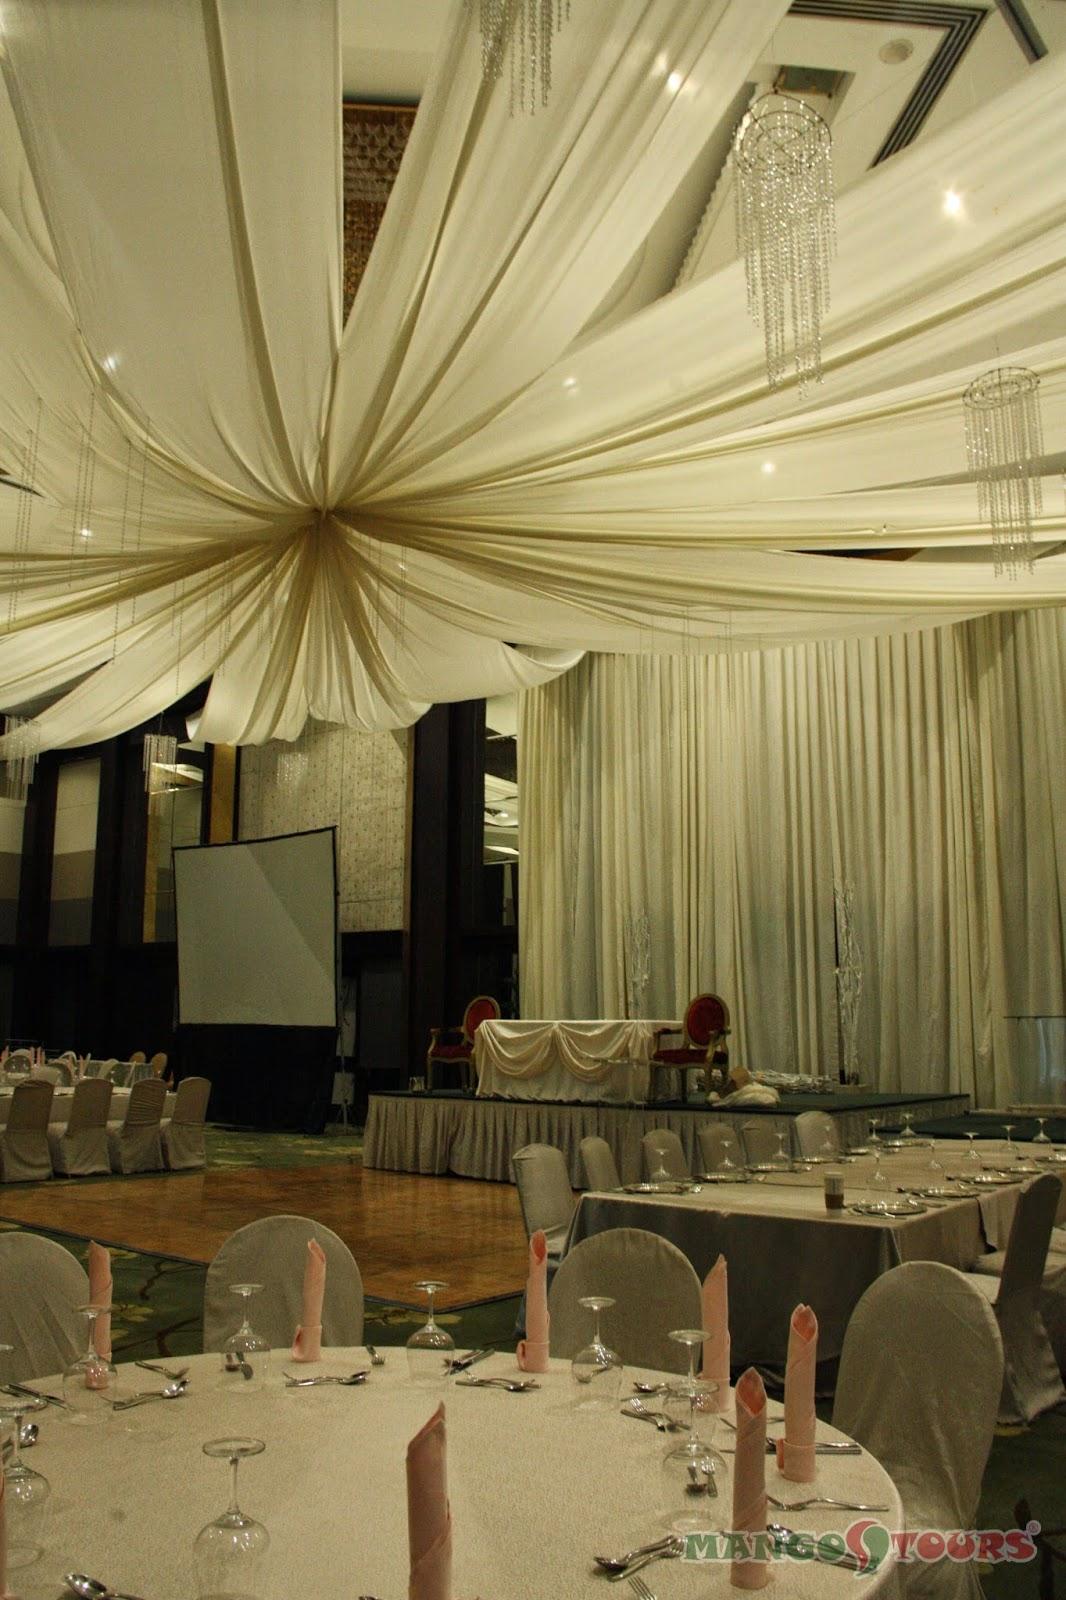 Mango Tours Diamond Hotel Philippines Ballroom